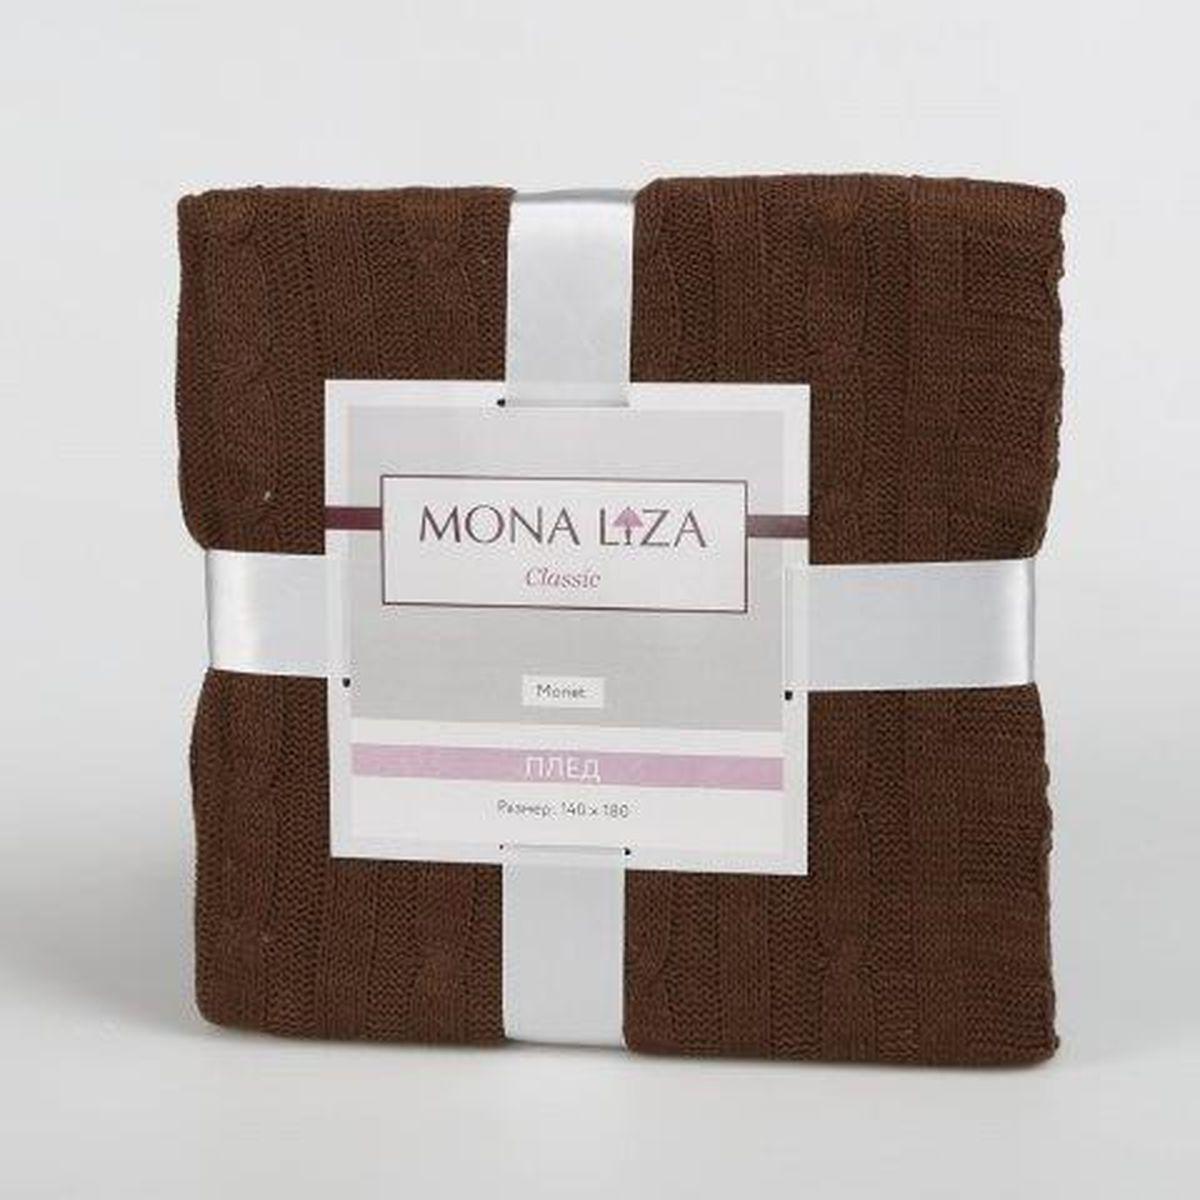 Плед Mona Liza Classic Monet, цвет: шоколадный, 140 х 180 см пледы mona liza плед steve mona lisa classic viva